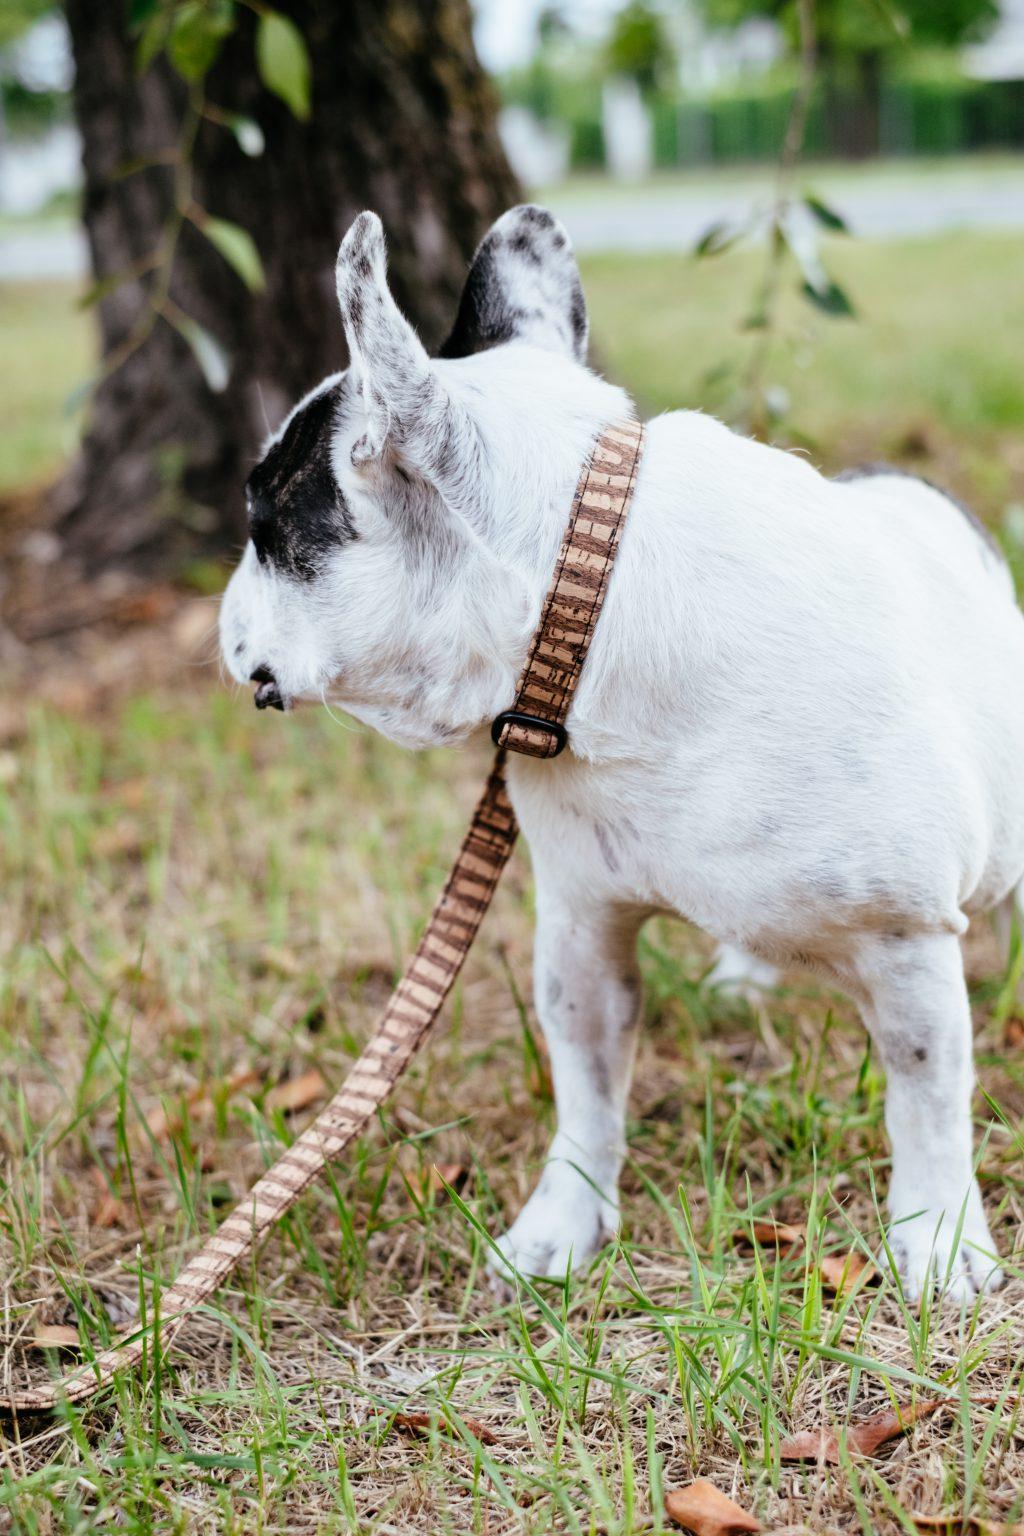 French Bulldog on a leash - free stock photo